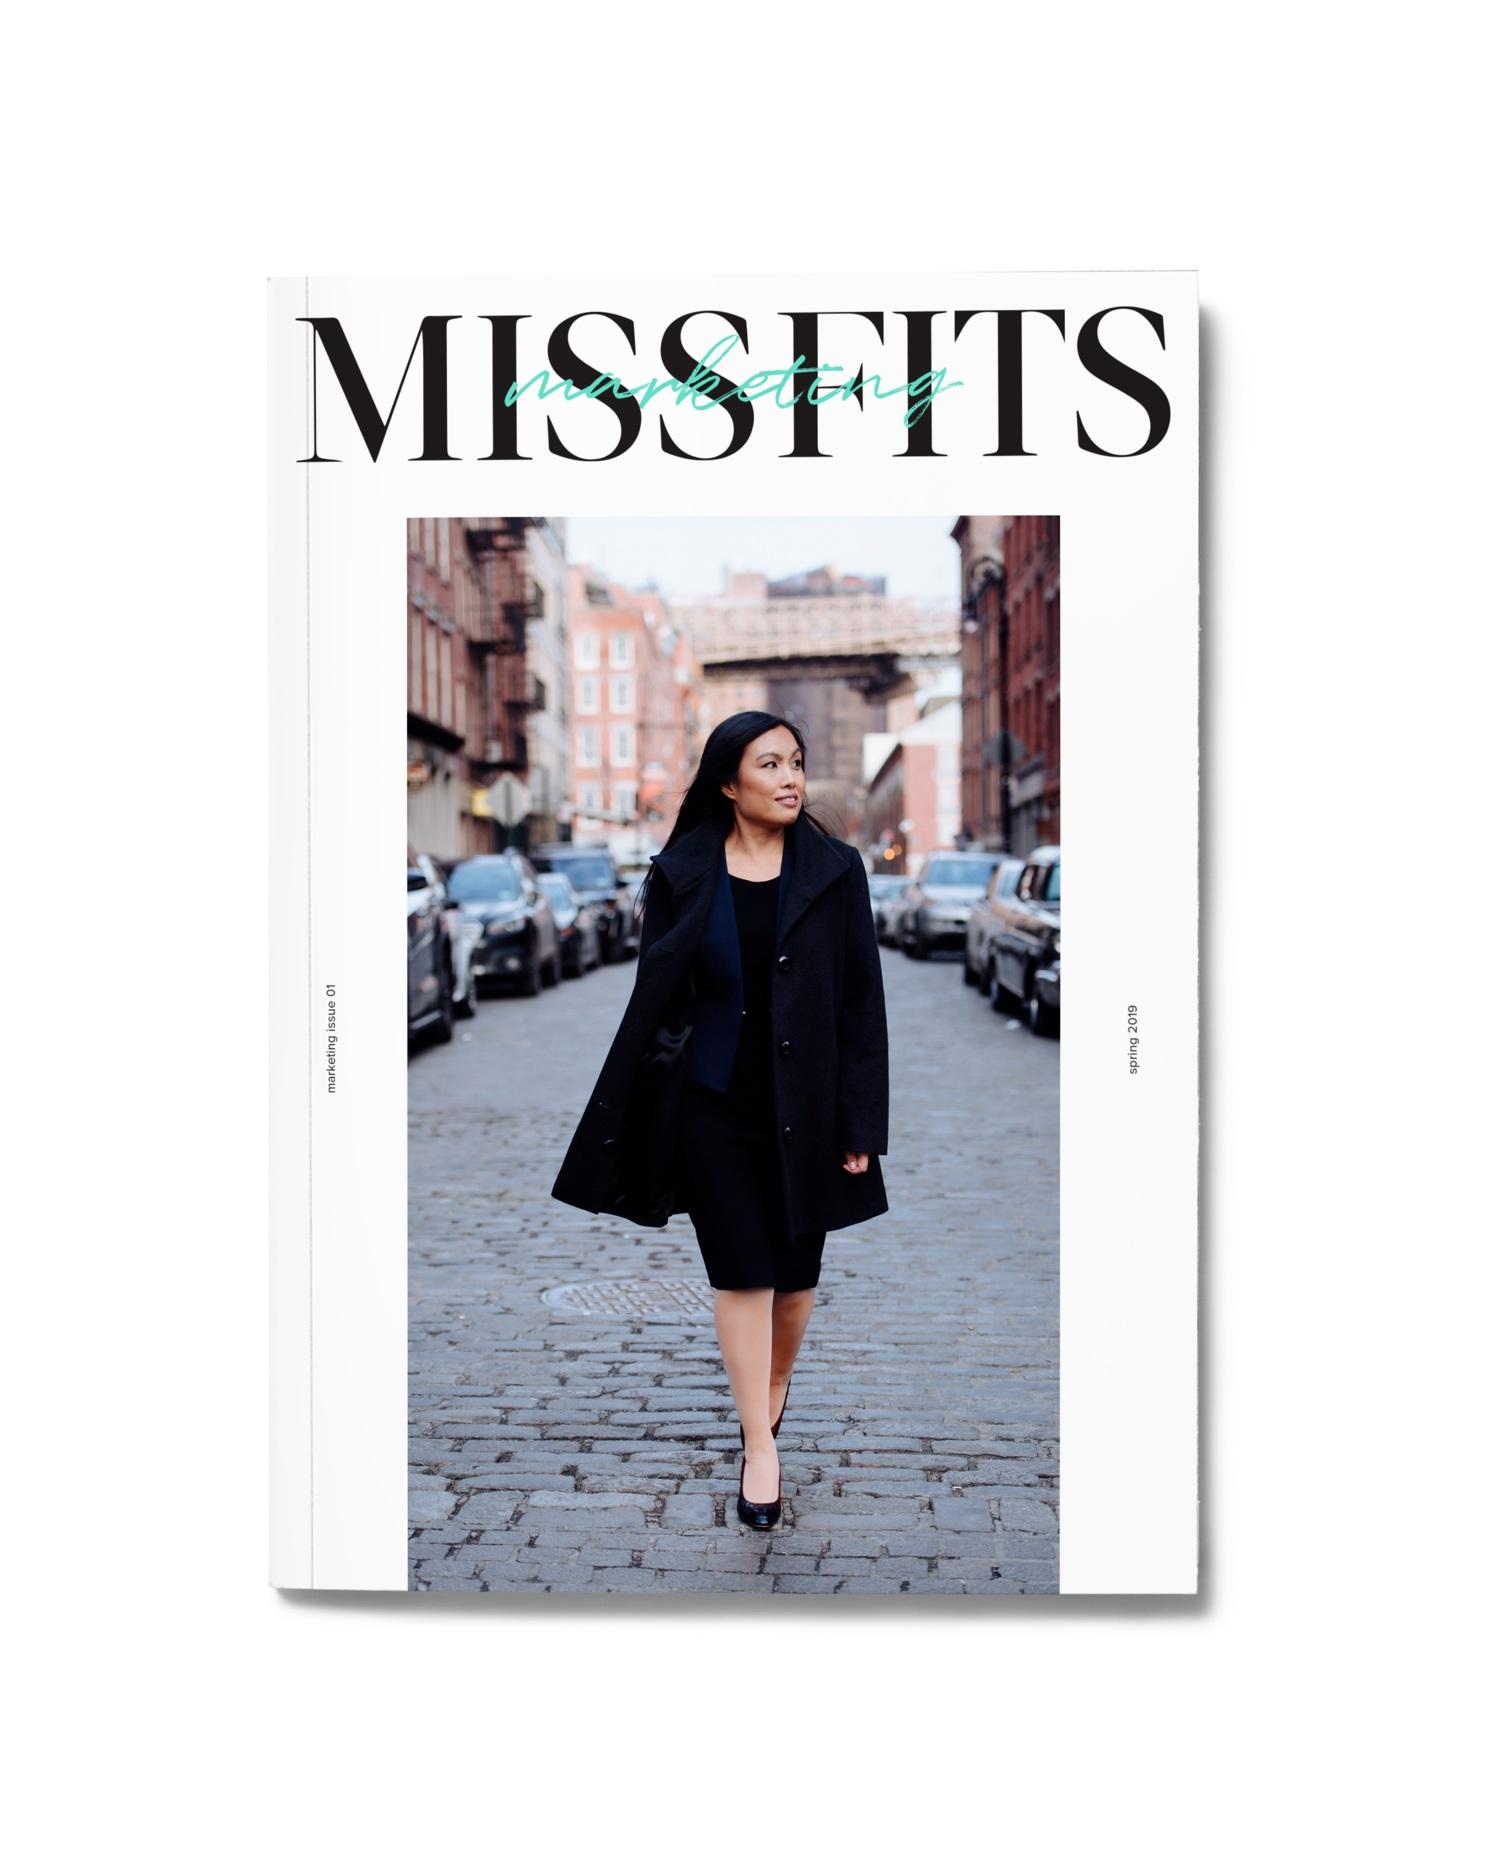 missfits-cover-mockup.jpg